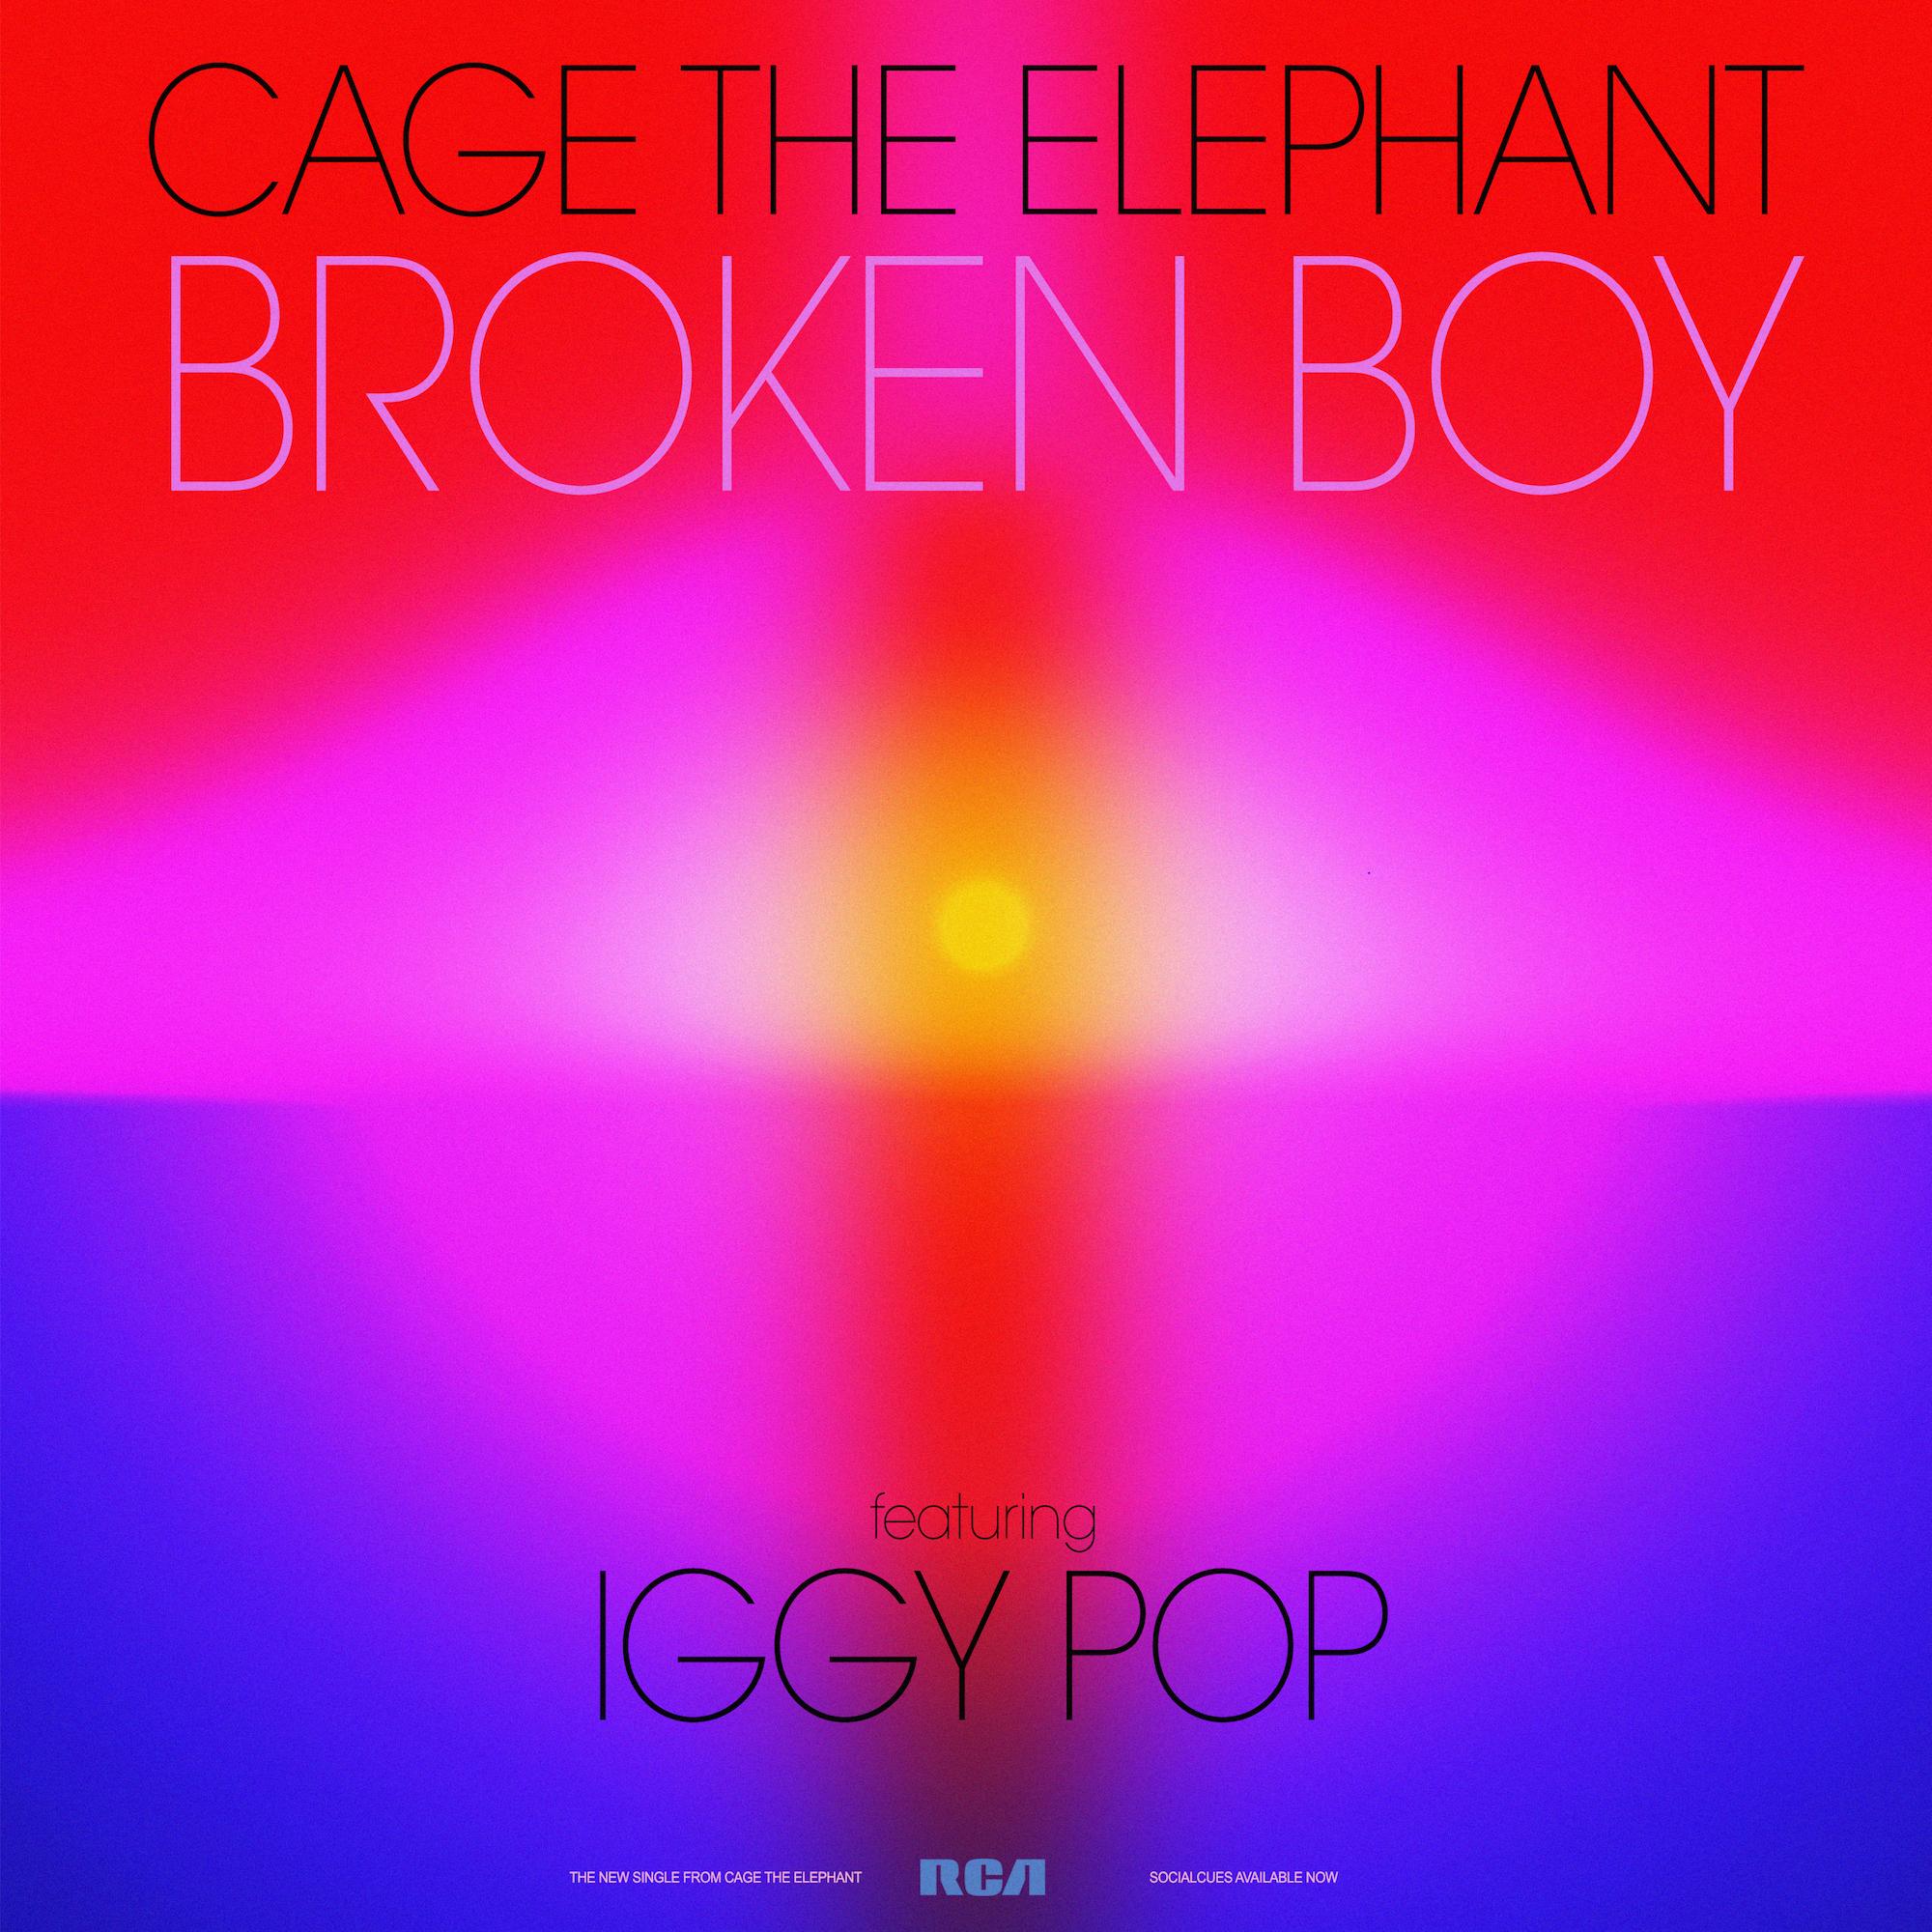 Broken Boy featuring Iggy Pop!